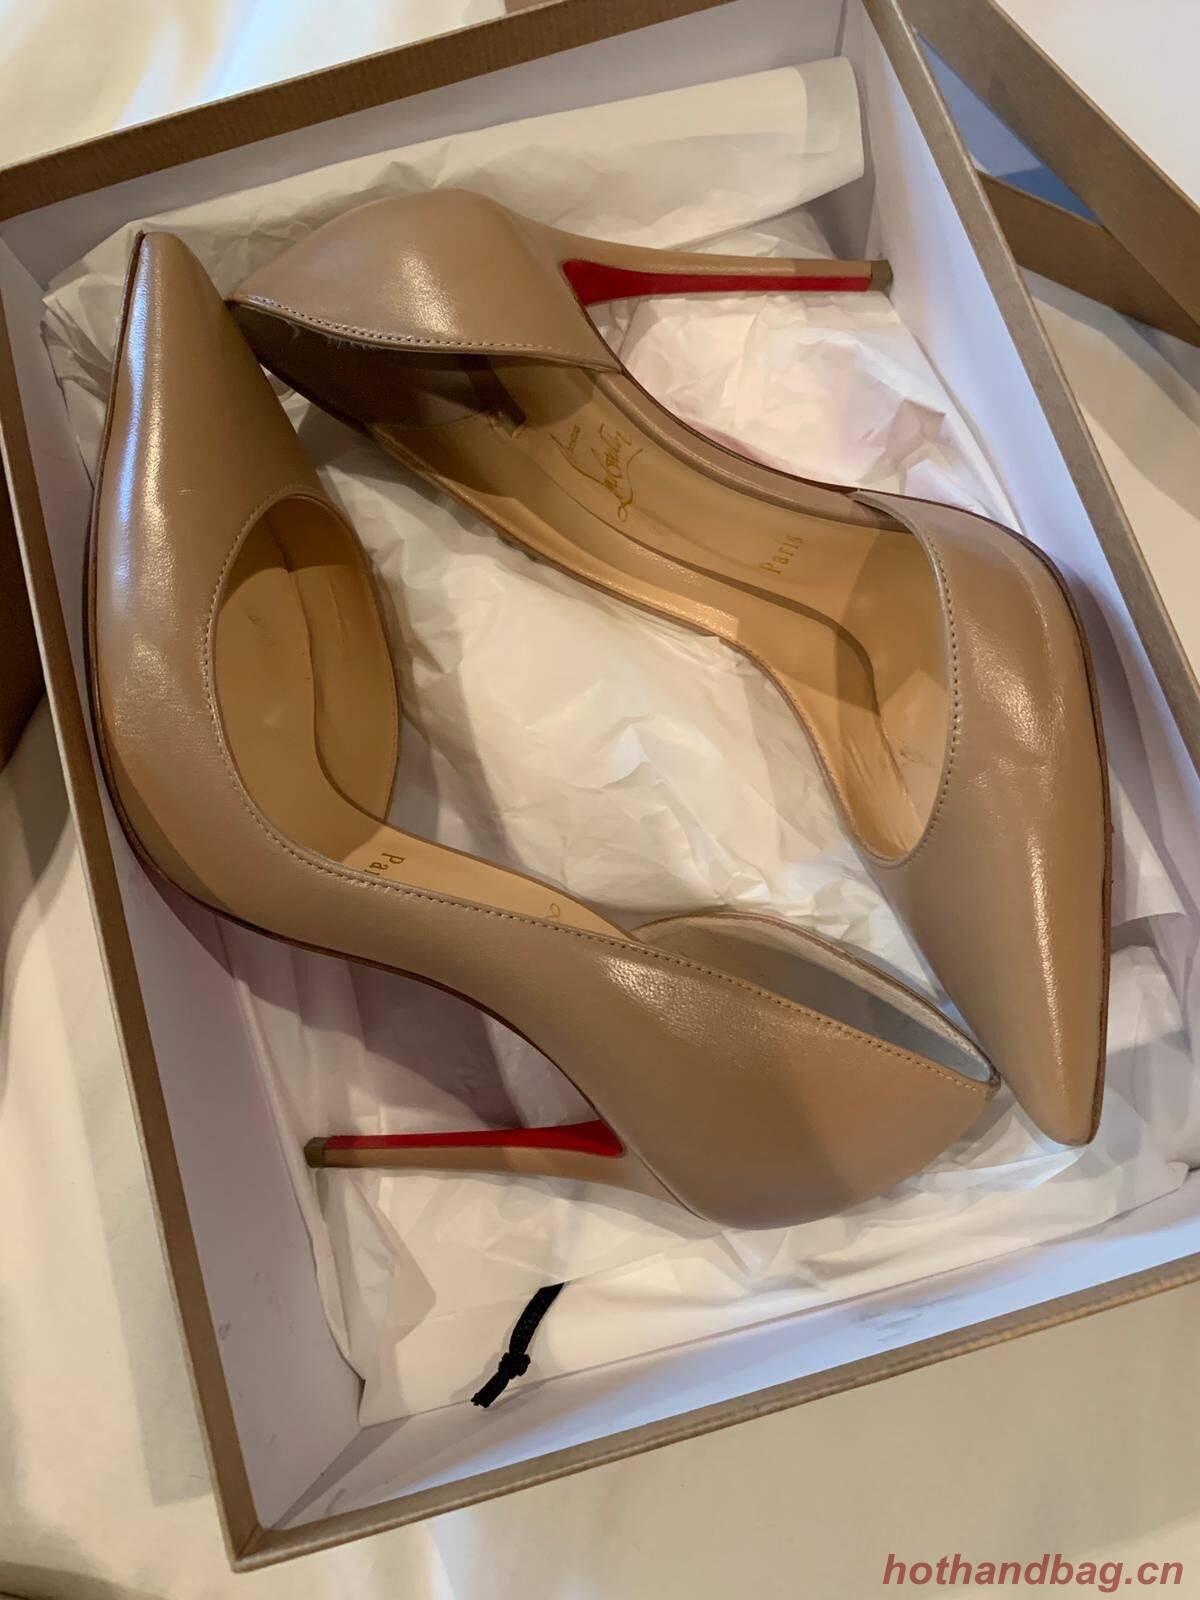 Christian Louboutin Heels Shoes CL8896 Nude